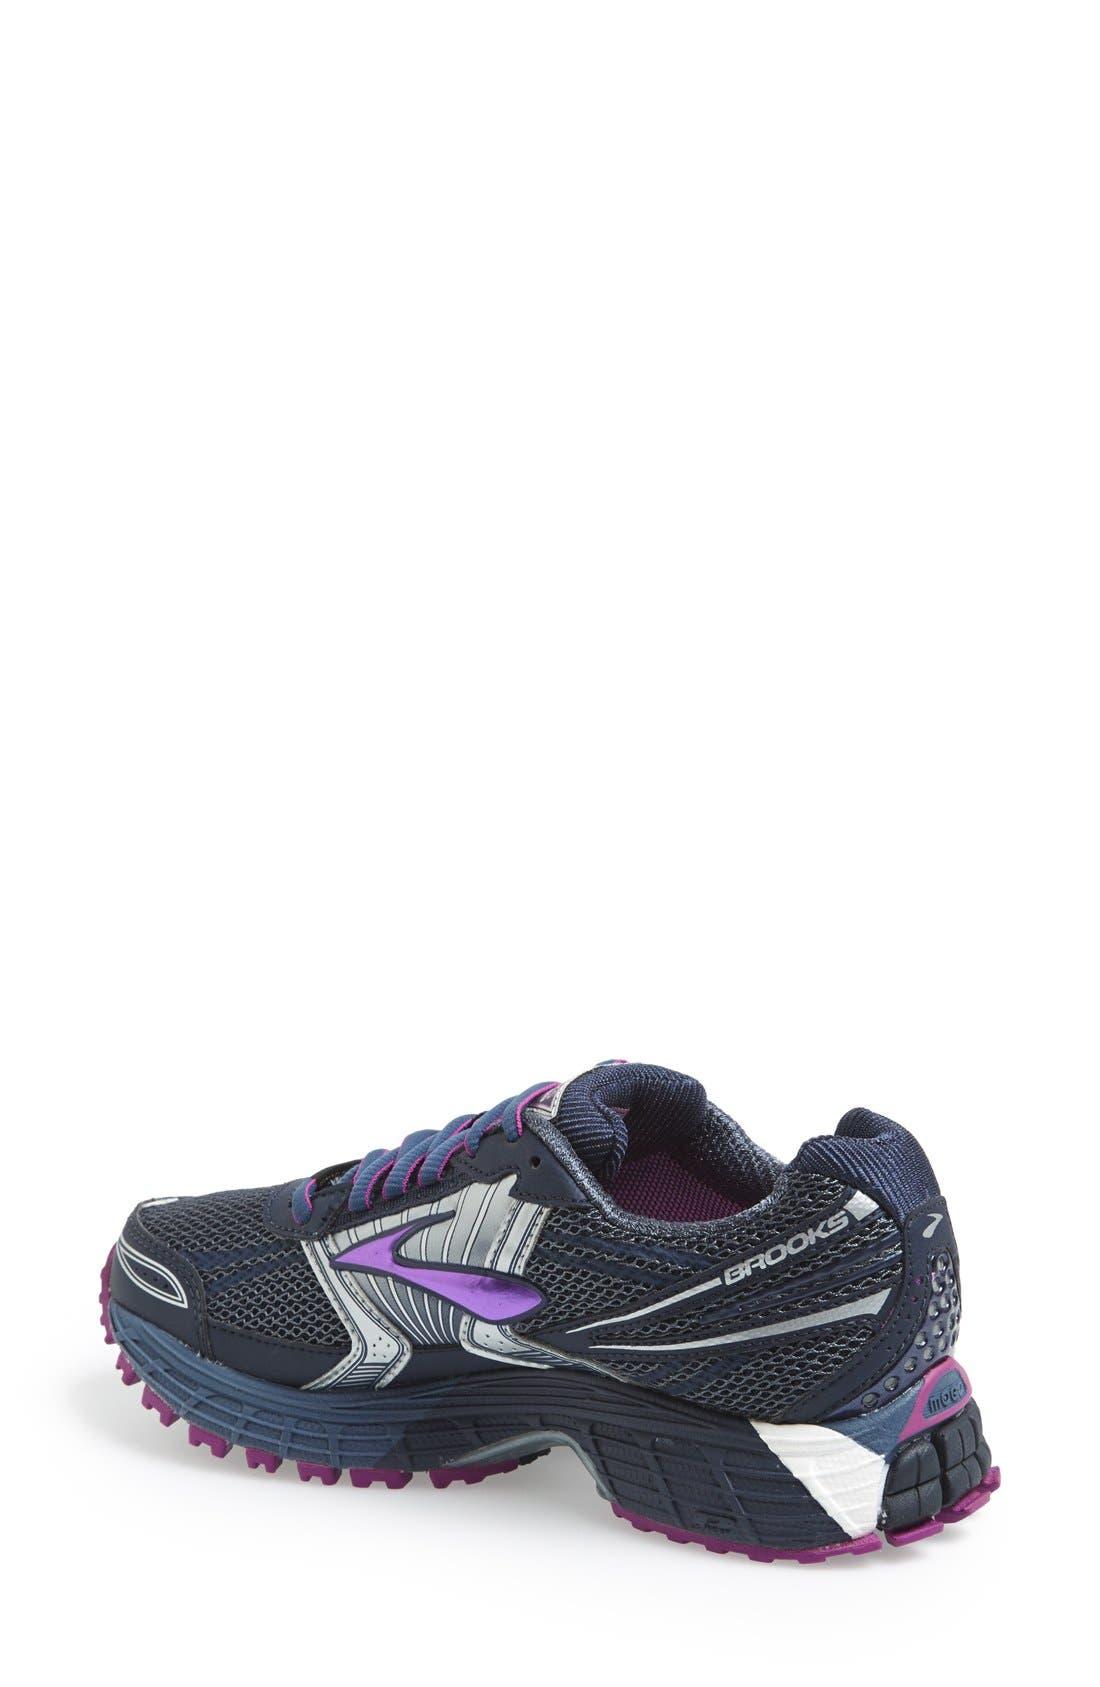 Alternate Image 2  - Brooks 'Adrenaline ASR 11 GTX' Waterproof Running Shoe (Women)